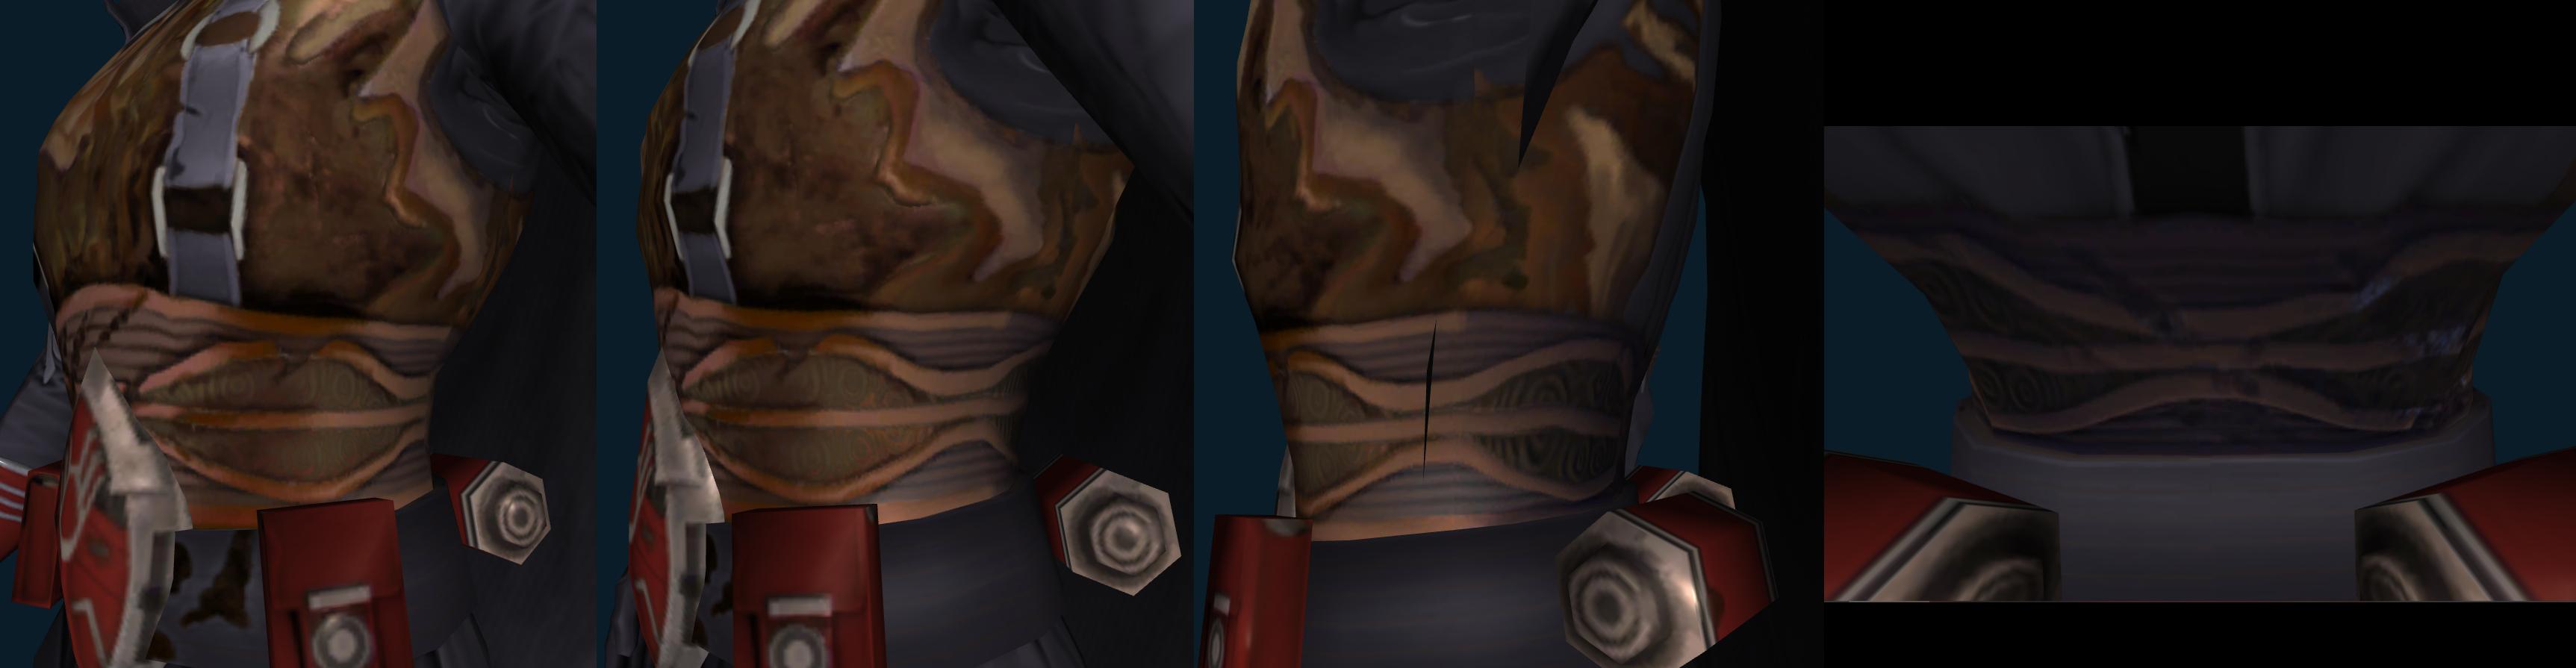 Swtor-SoR-corset-profile2.jpg